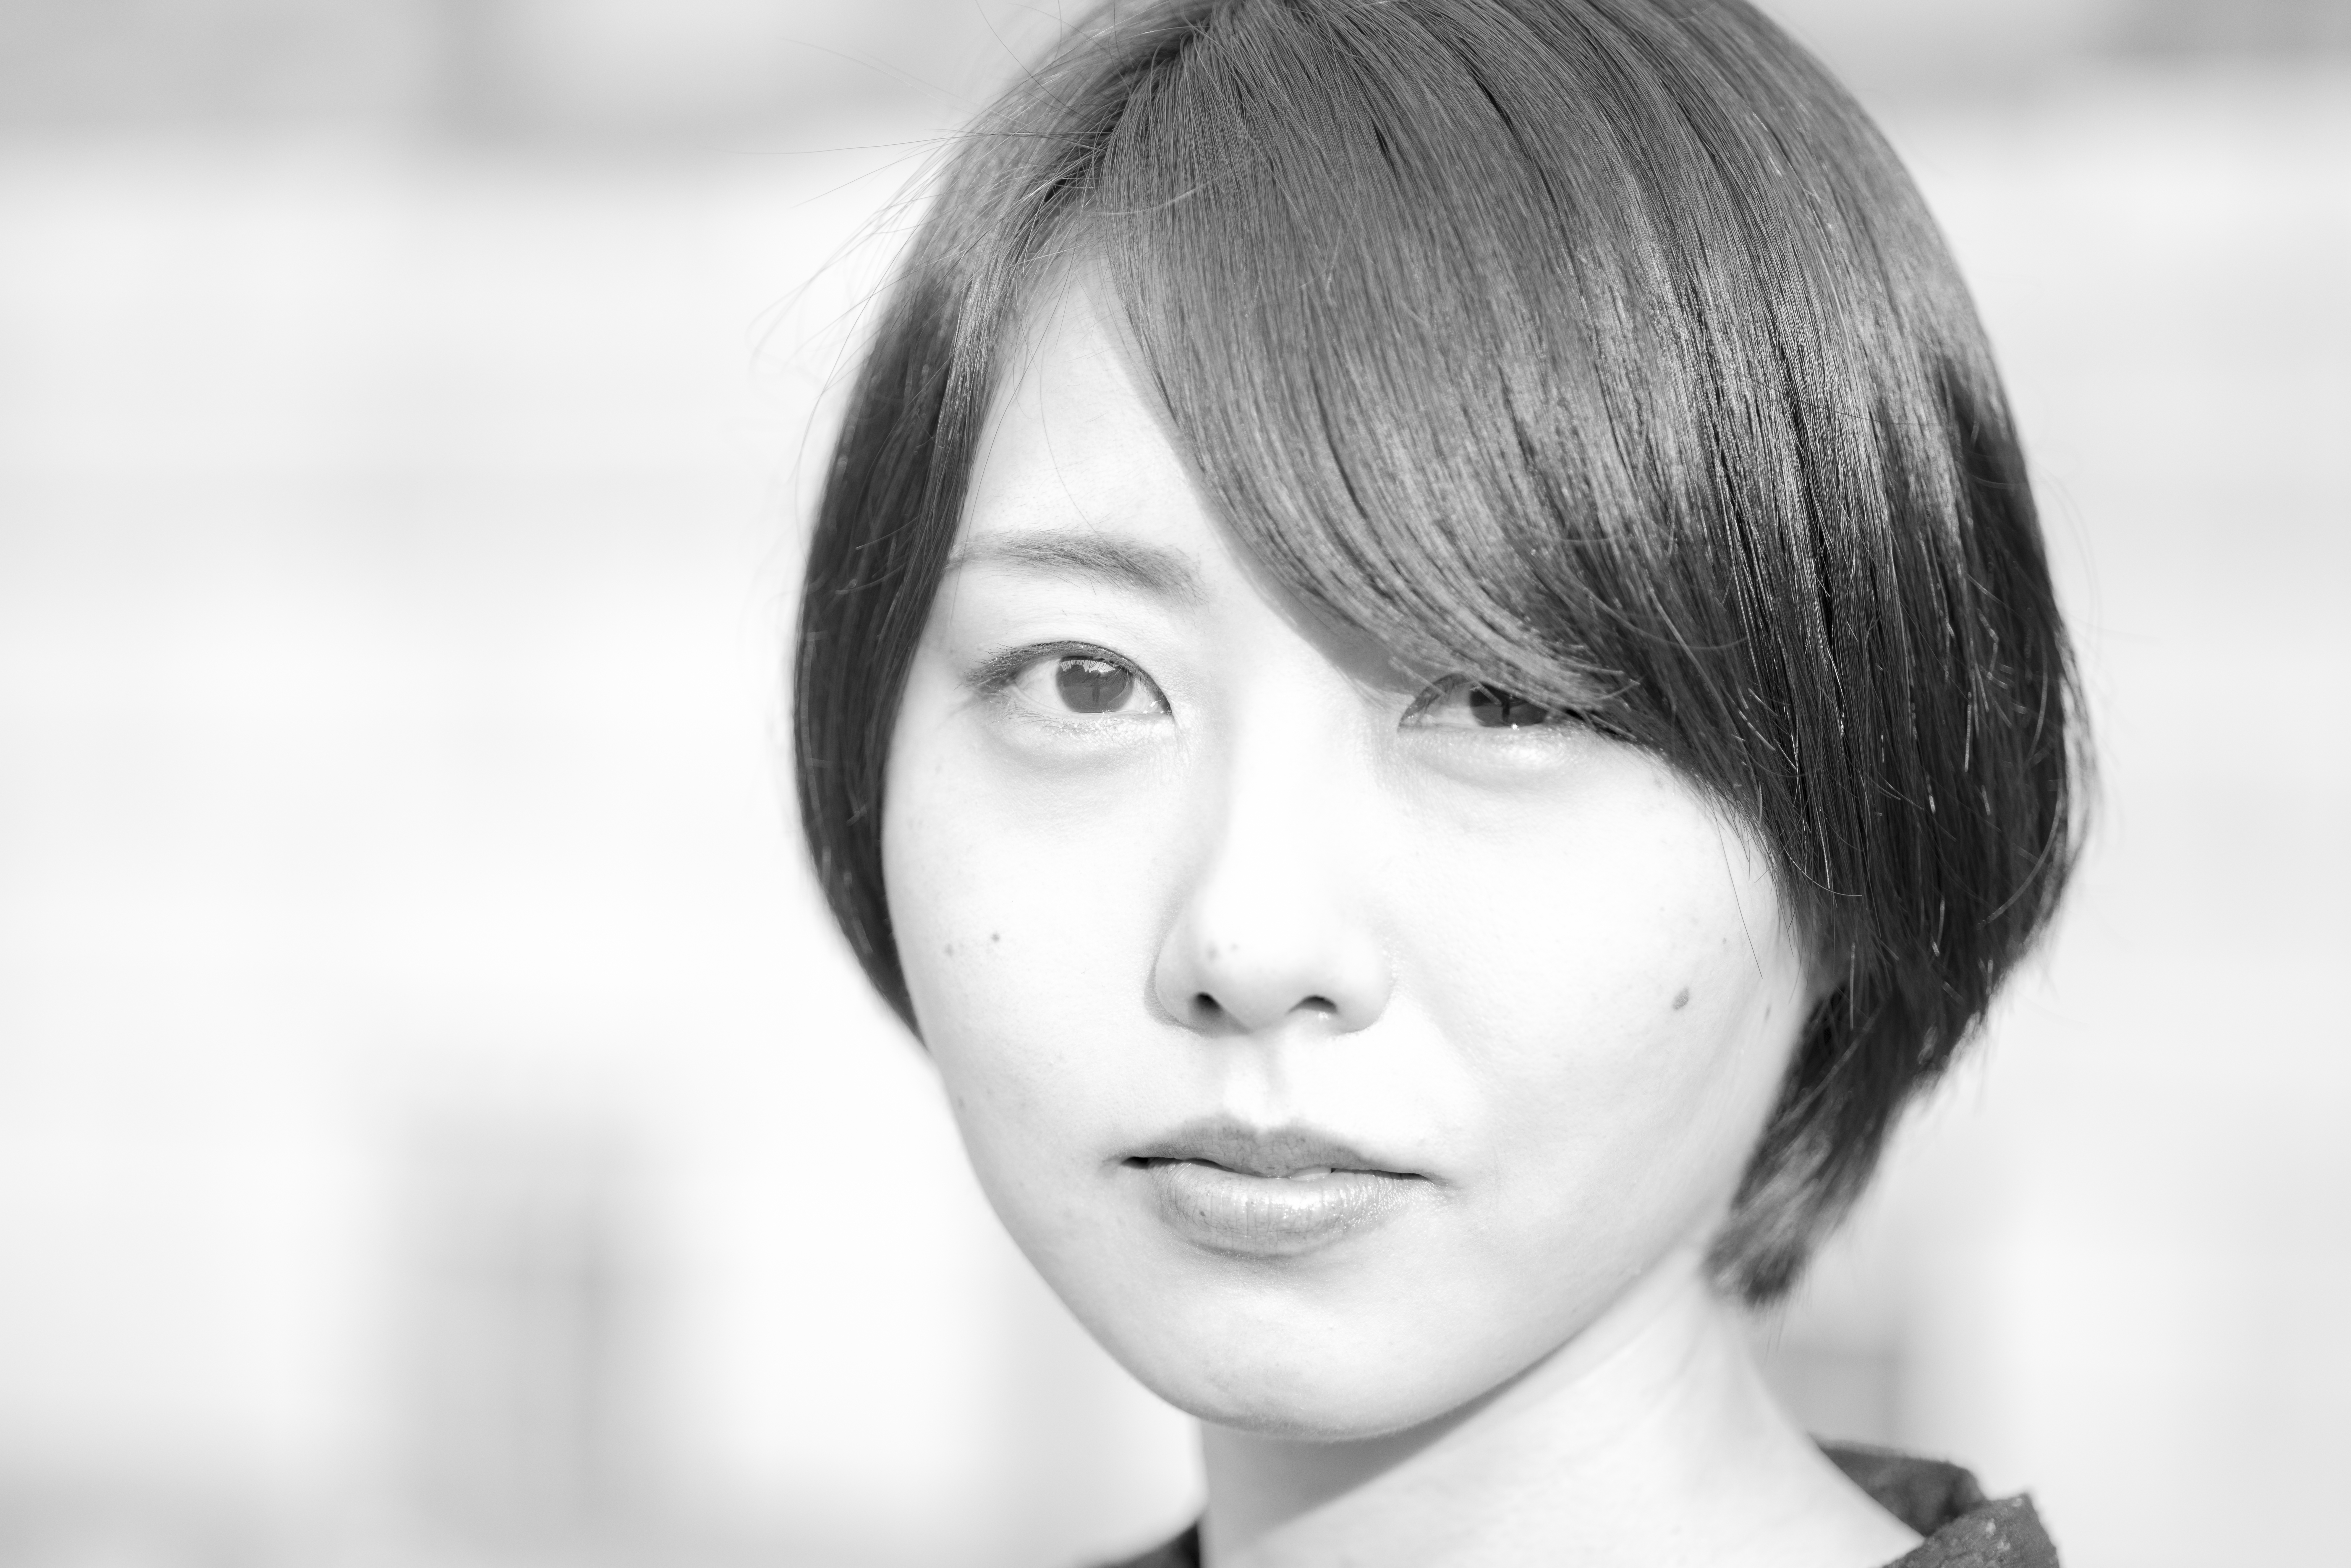 Model: Misato